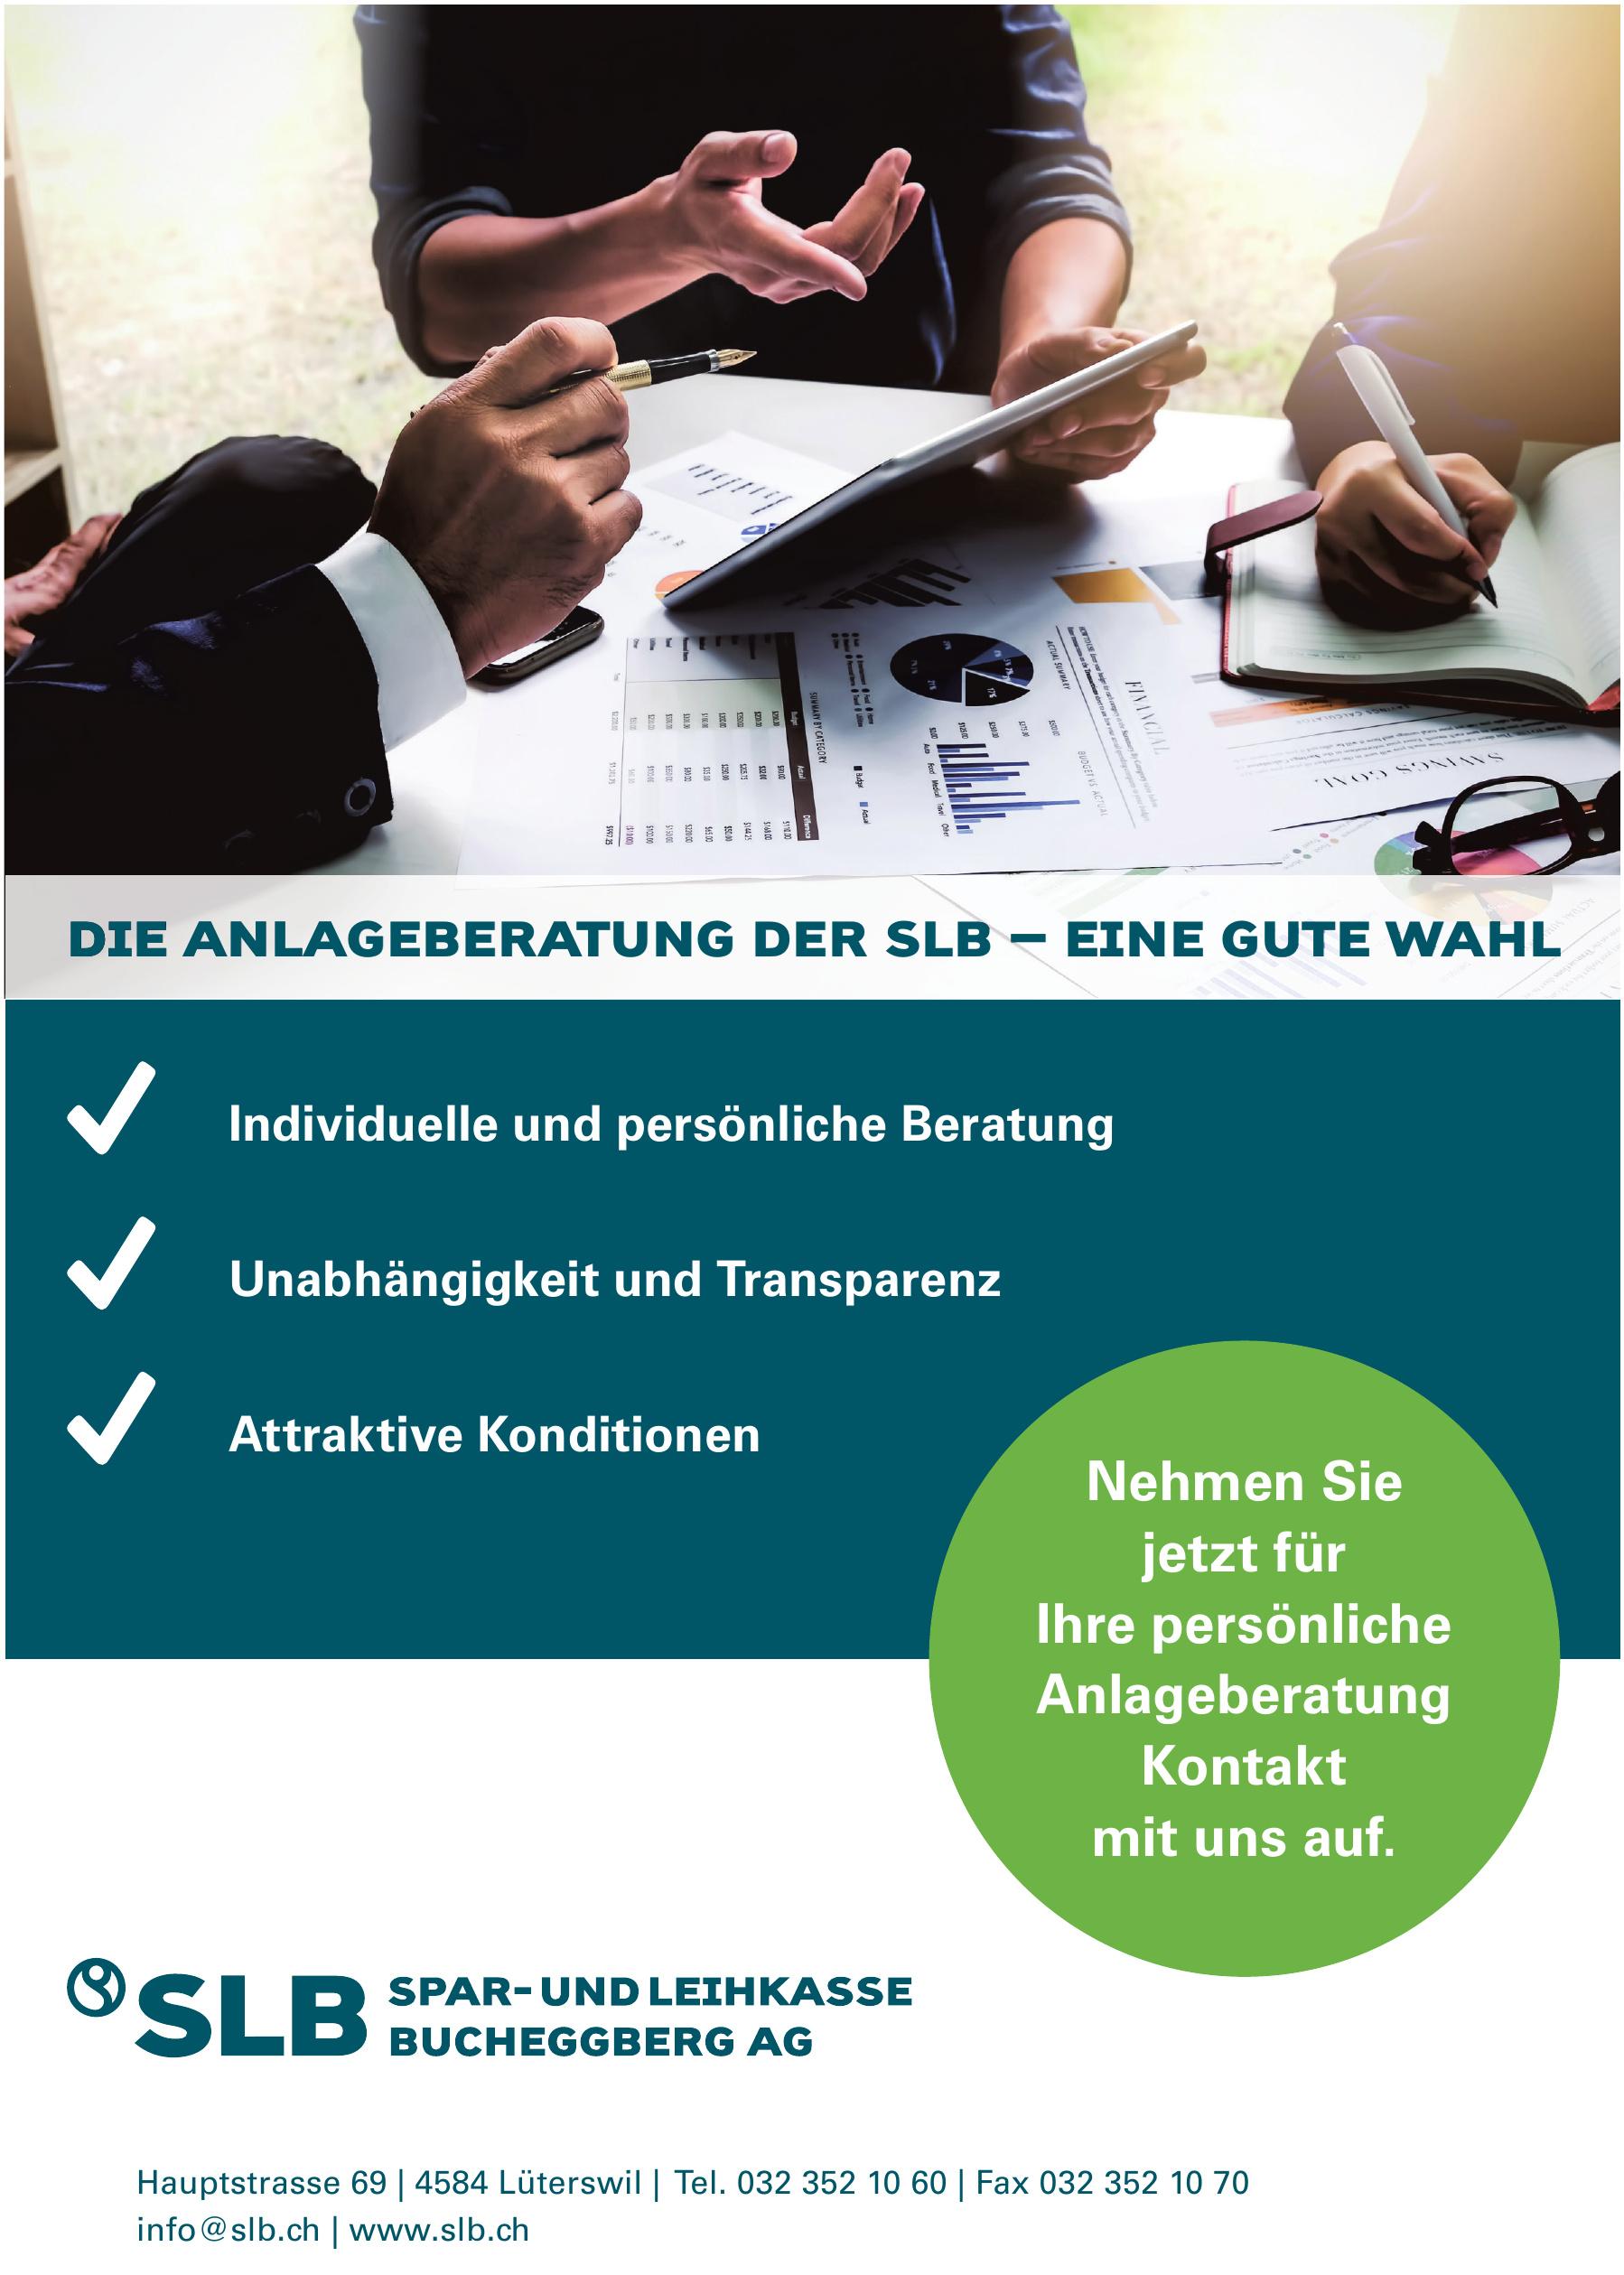 SLB Spar und Leihkasse Bucheggberg AG